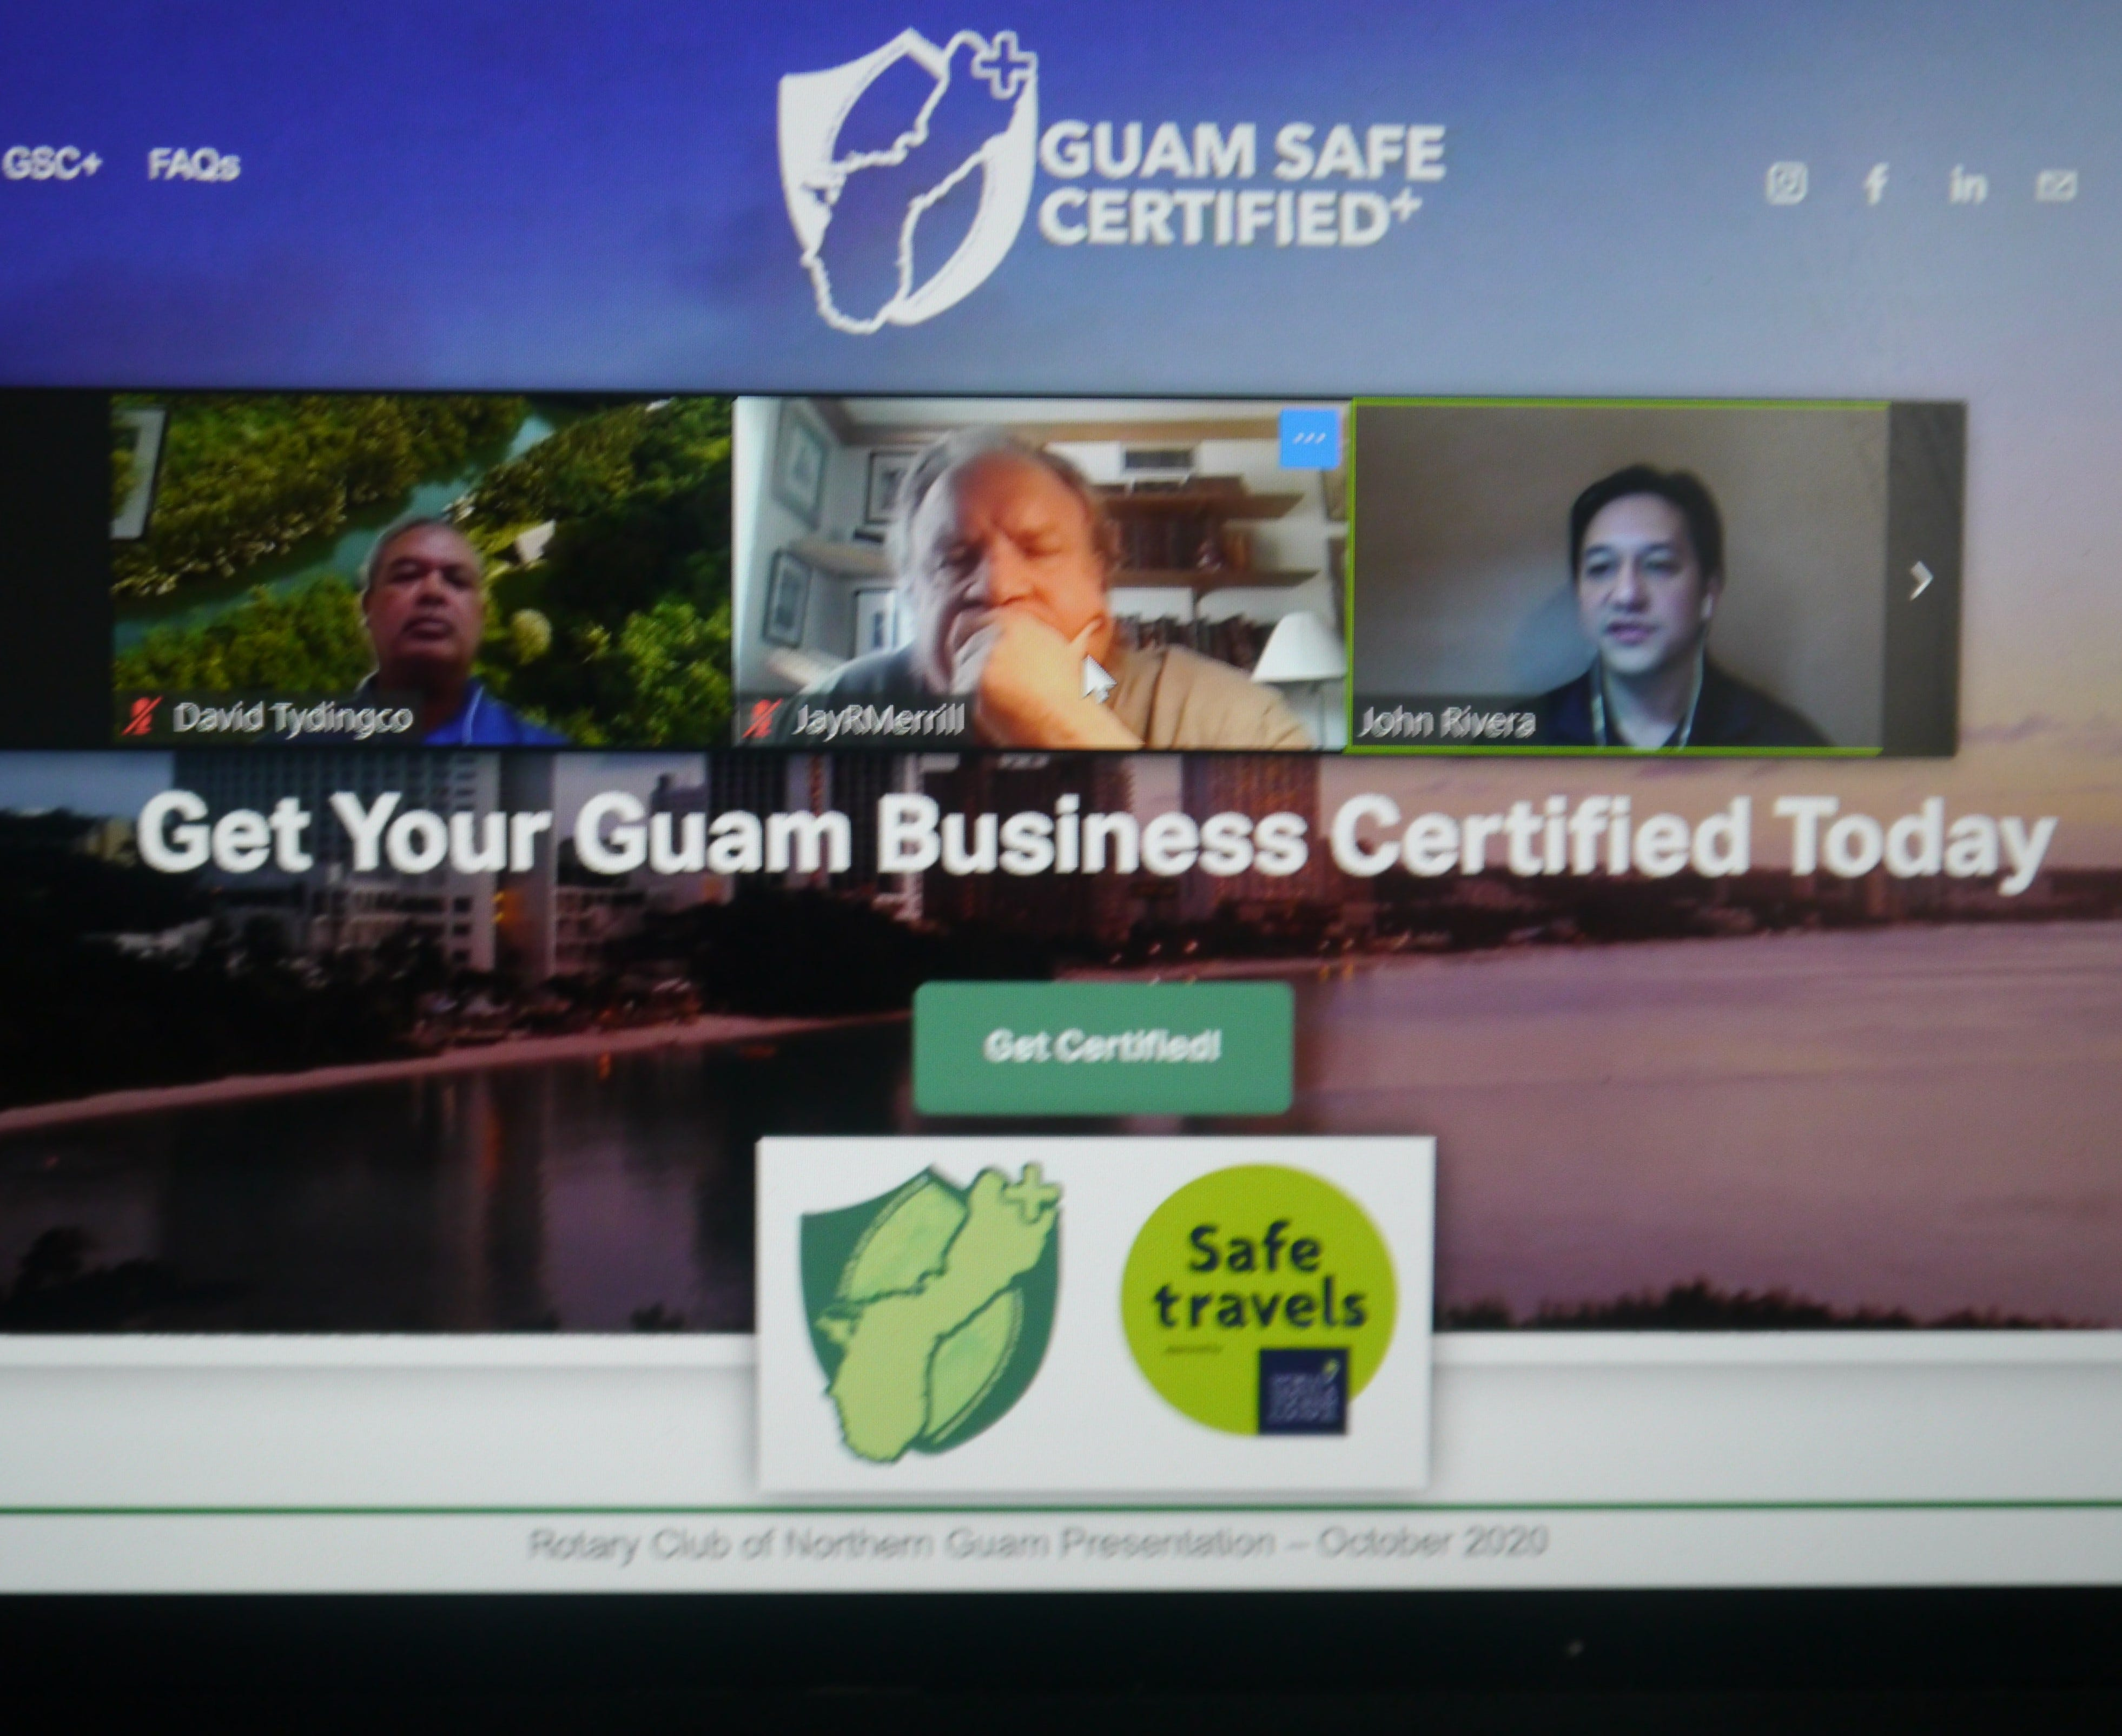 Rotary Club of Northern Guam via Zoom